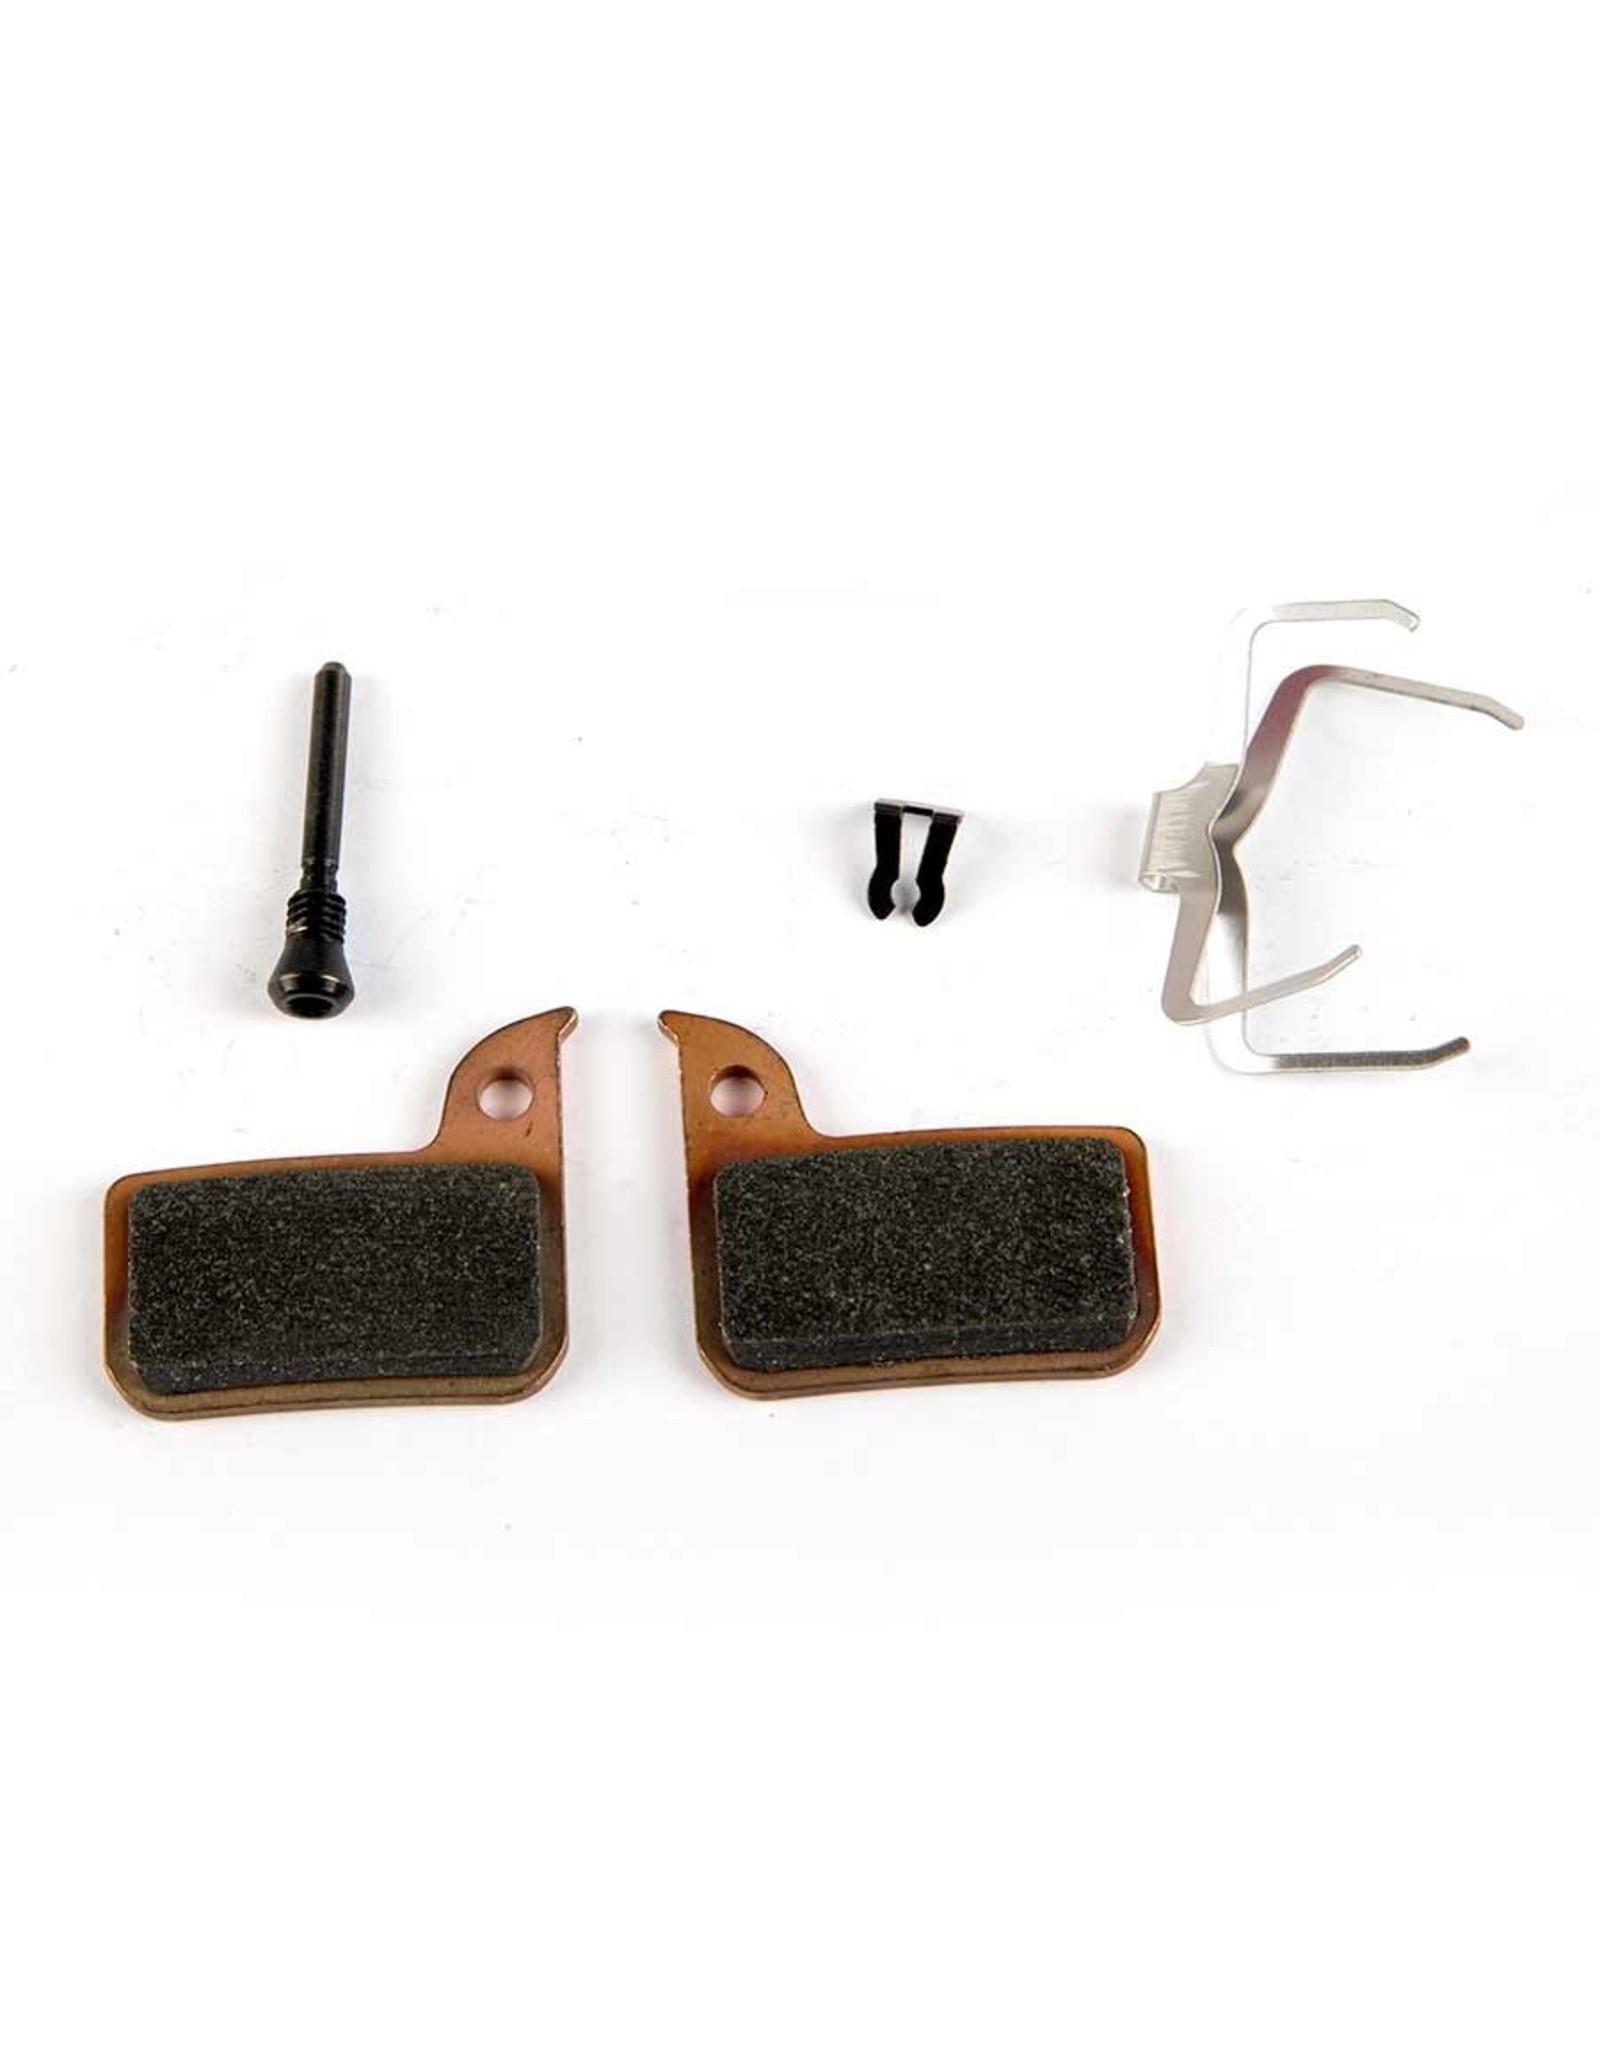 SRAM, Level TLM, Level Ultimate, HRD, Disc Brake Pads, Shape: SRAM HRD/Level TLM, Metallic, Pair-1